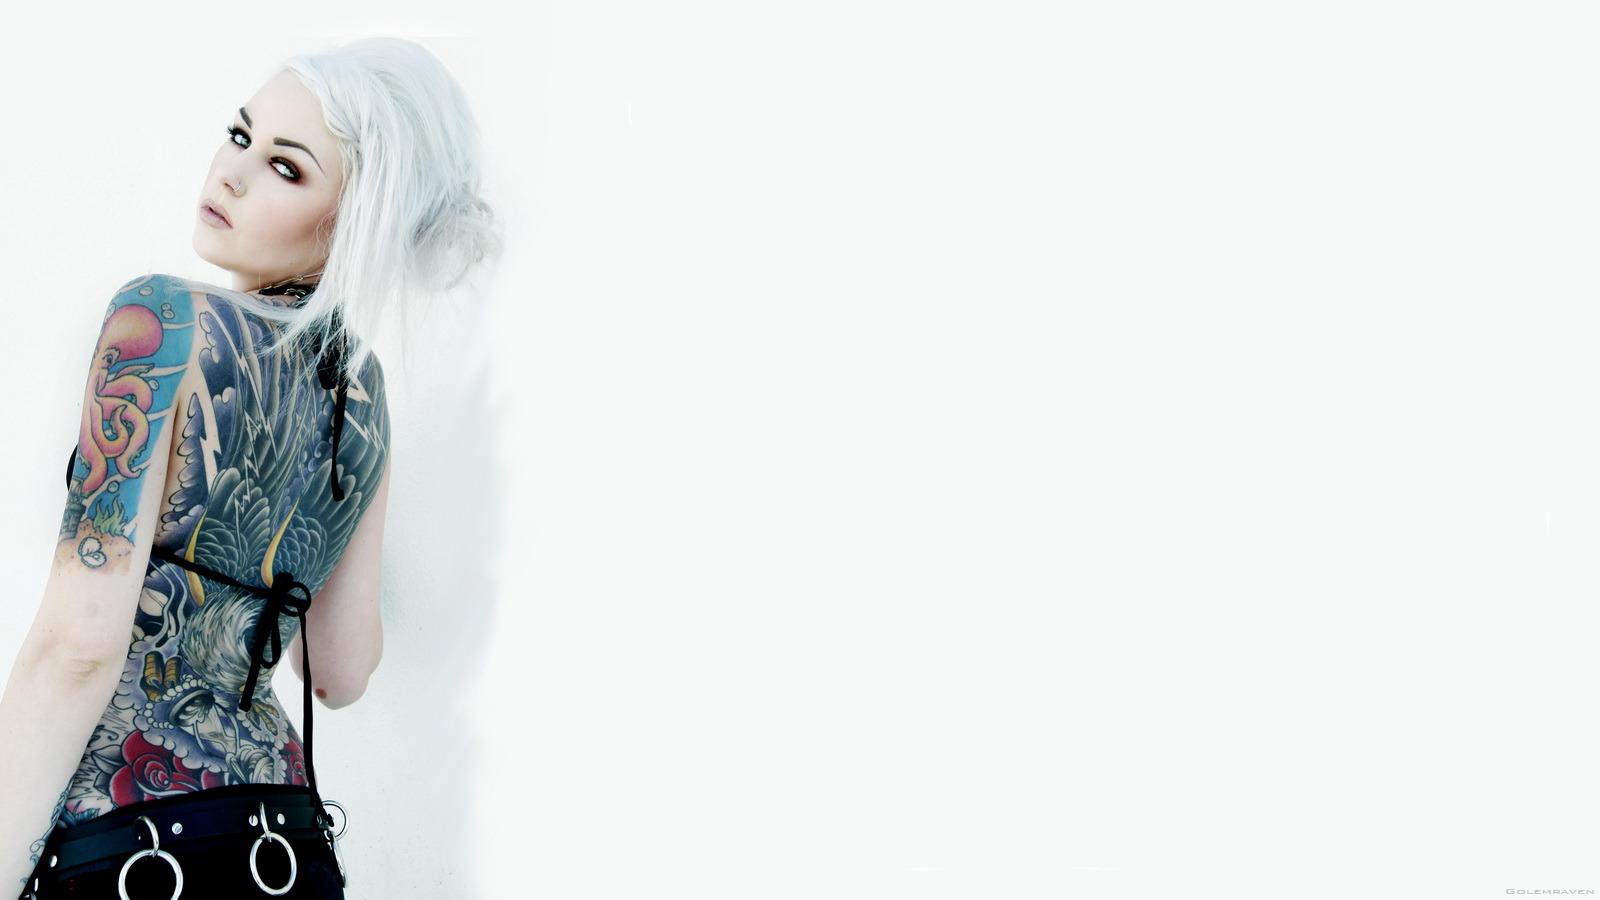 Beautiful Girl Hd Wallpapers 1080p Download Papel De Parede 1600x900 Px Kristen Leanne Fundo